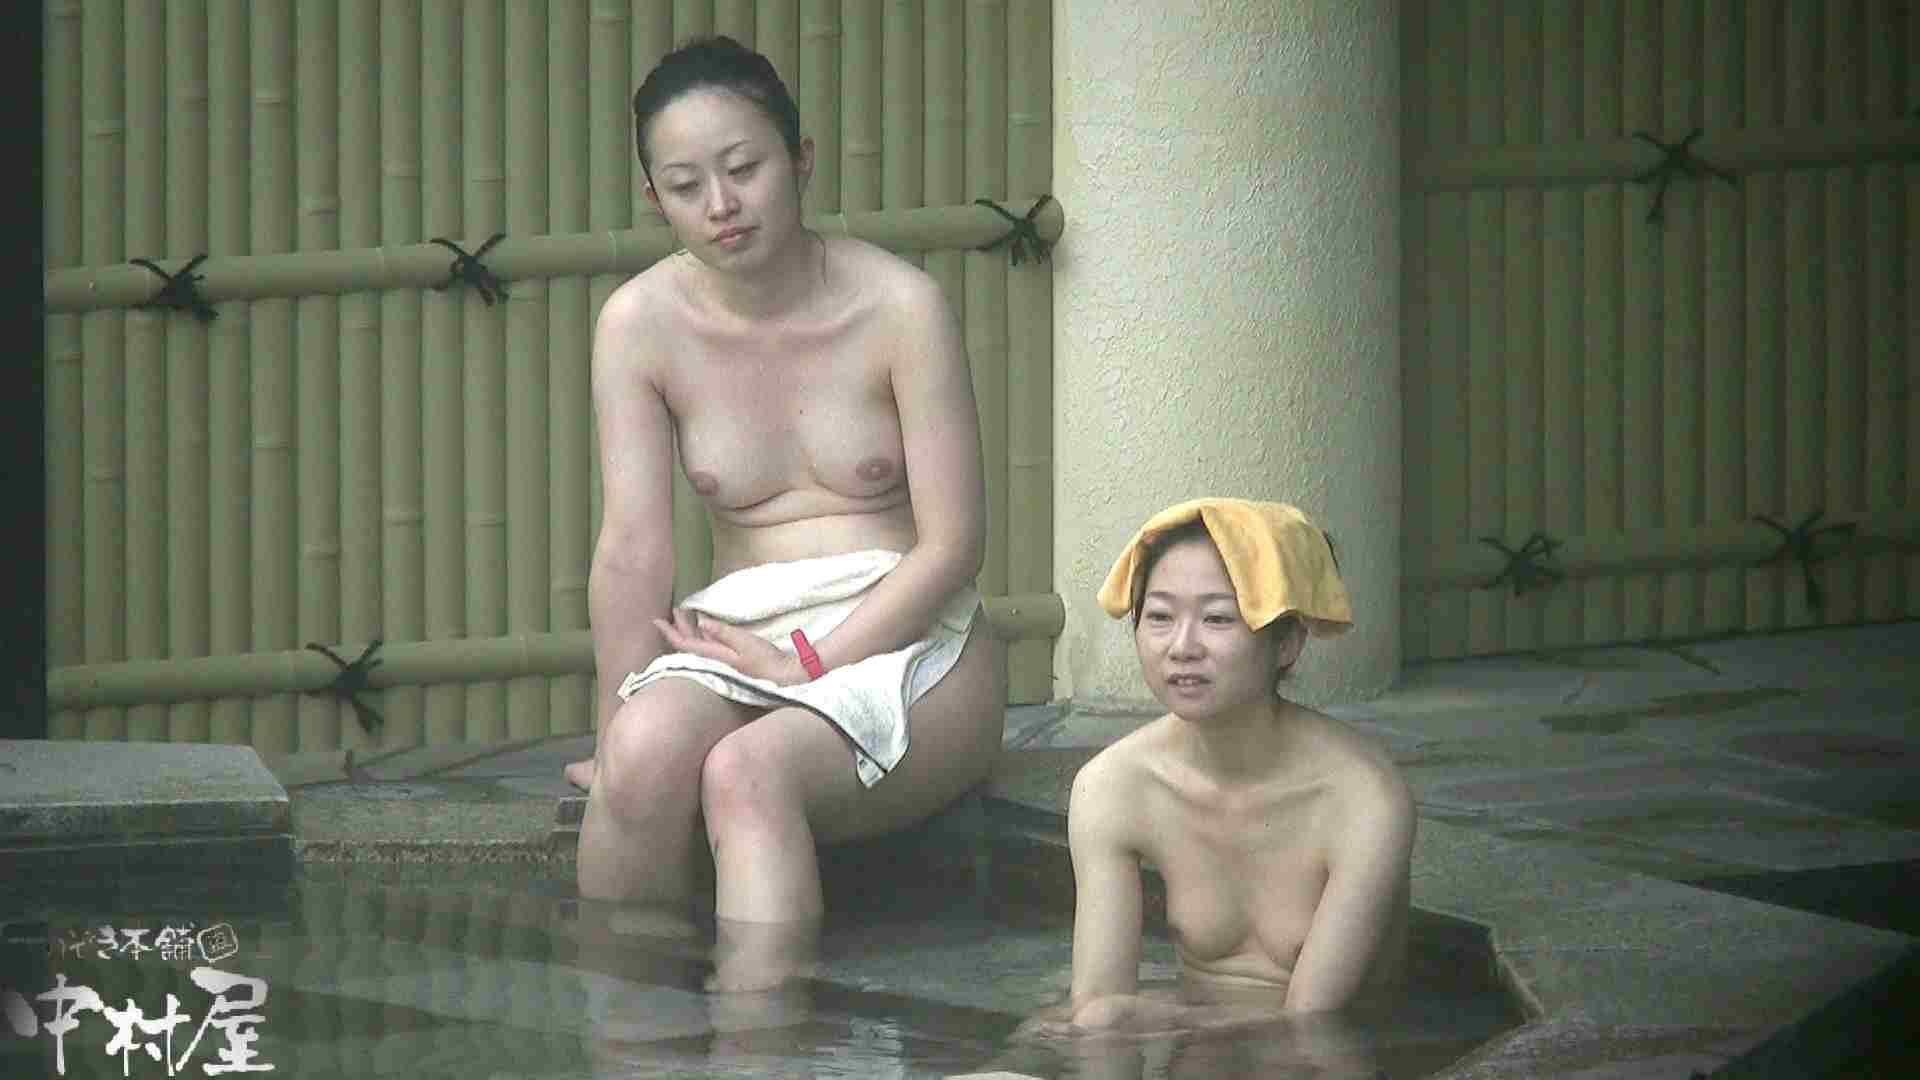 Aquaな露天風呂Vol.912 いやらしいOL われめAV動画紹介 73連発 22